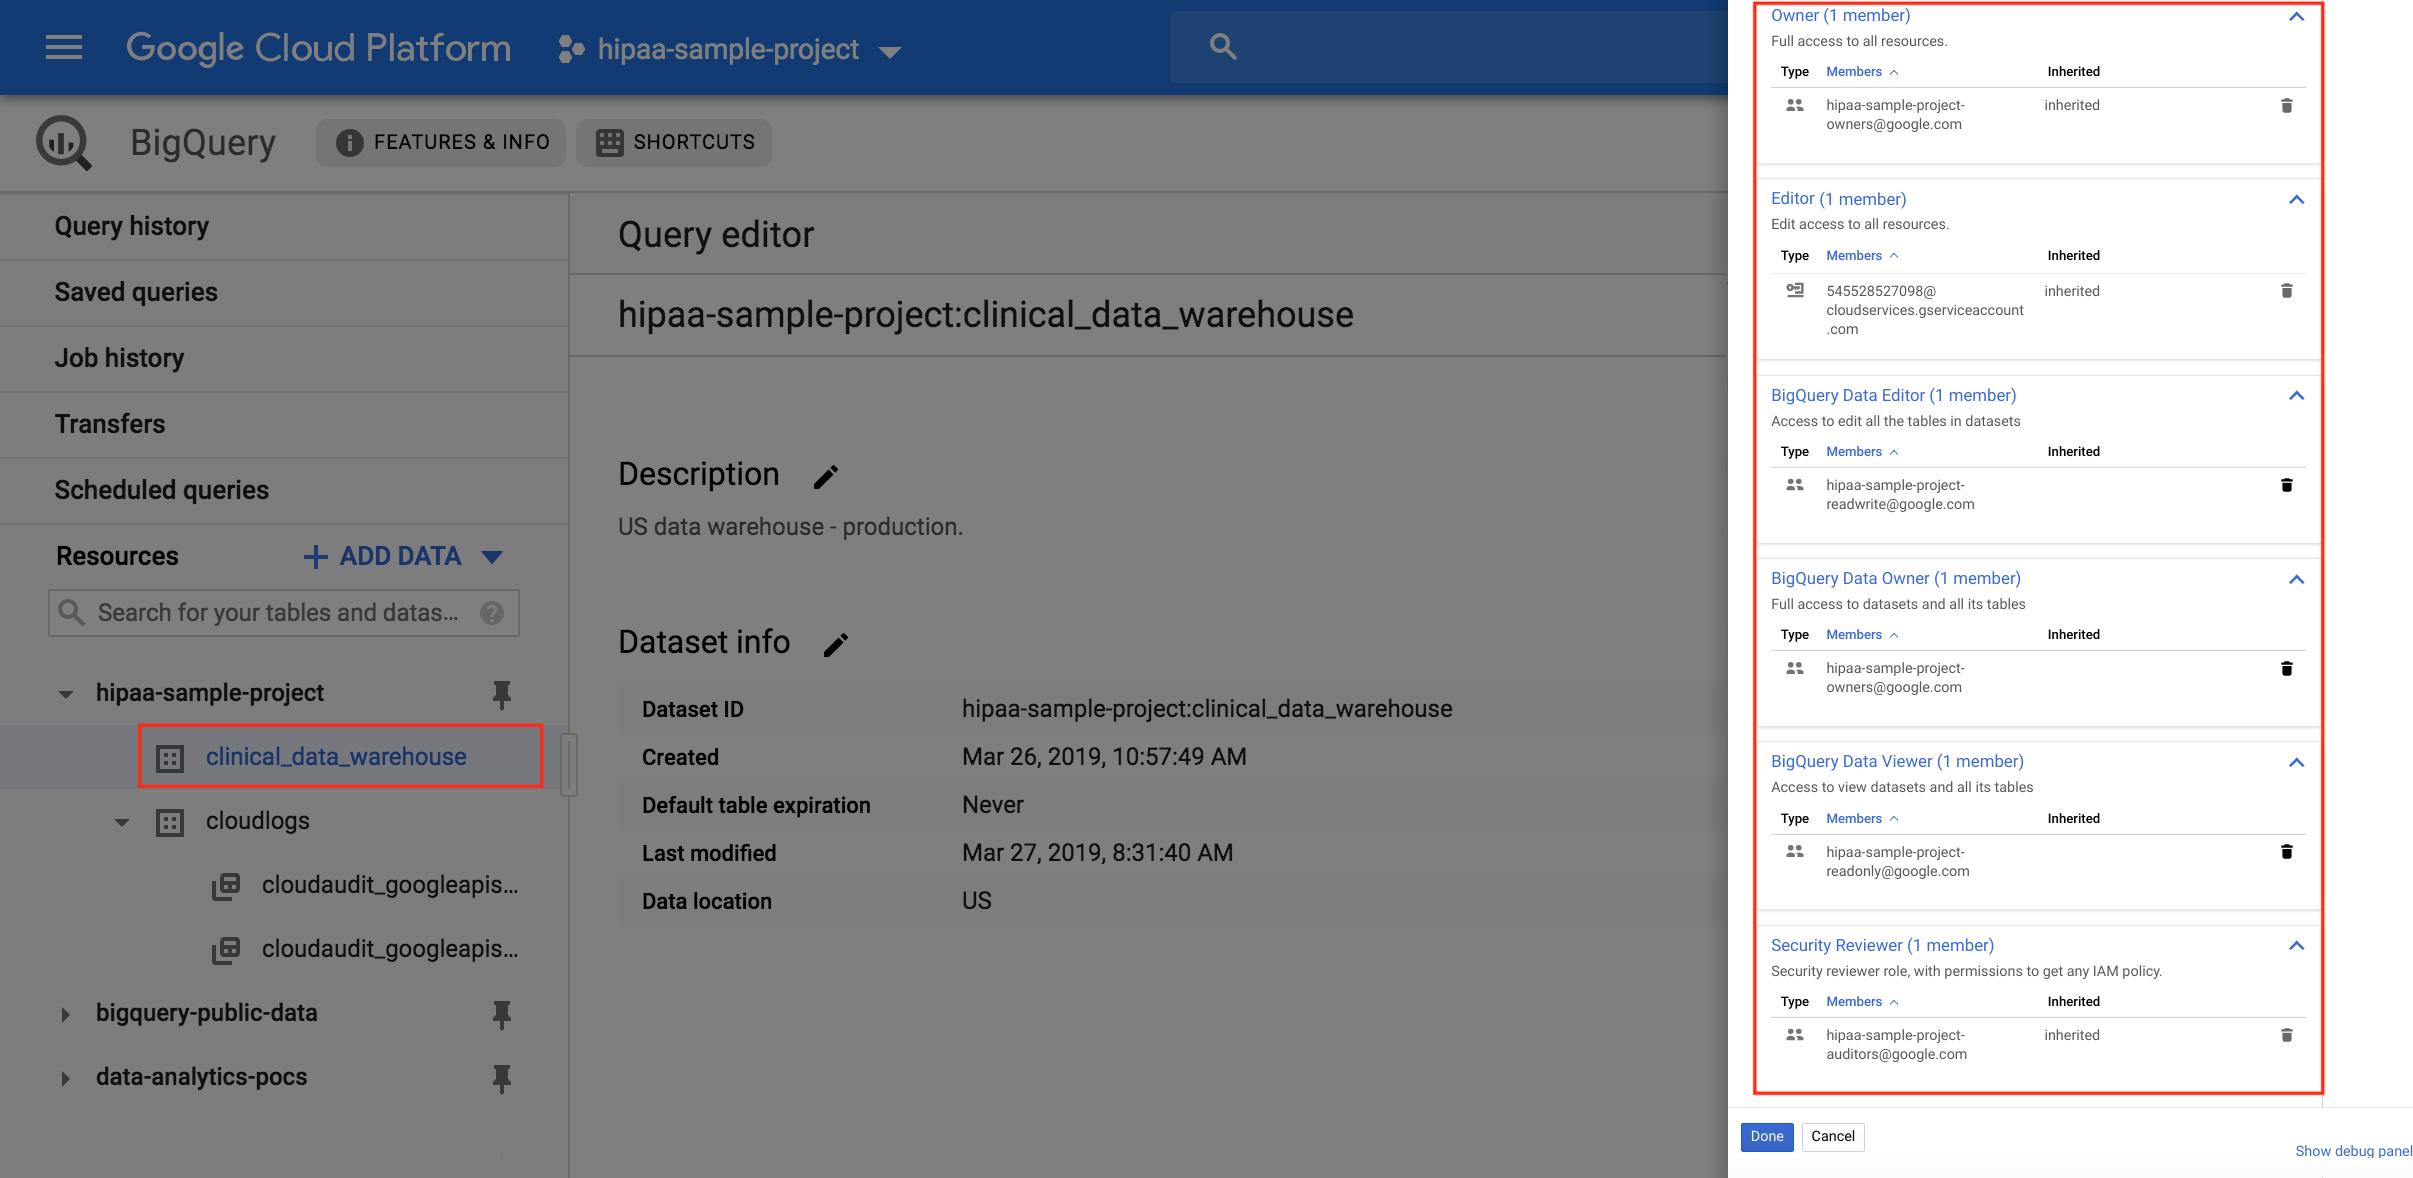 Permisos de datos de BigQuery para almacenar datos